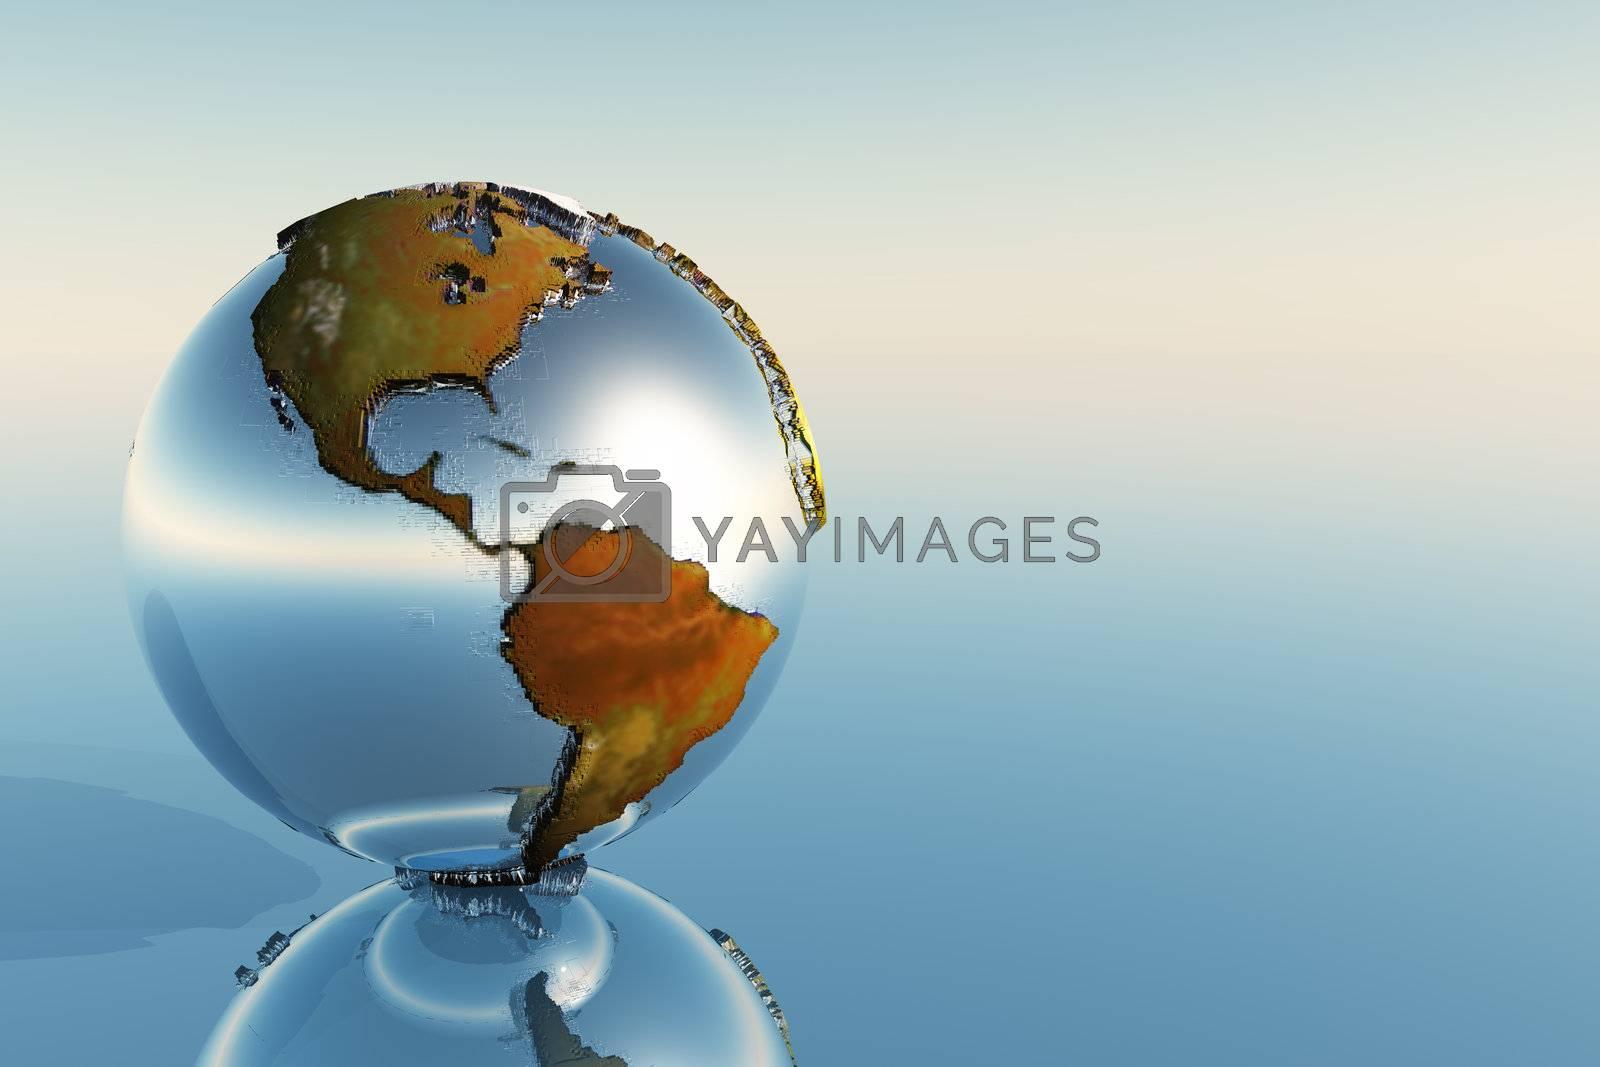 Royalty free image of GLOBE by Catmando